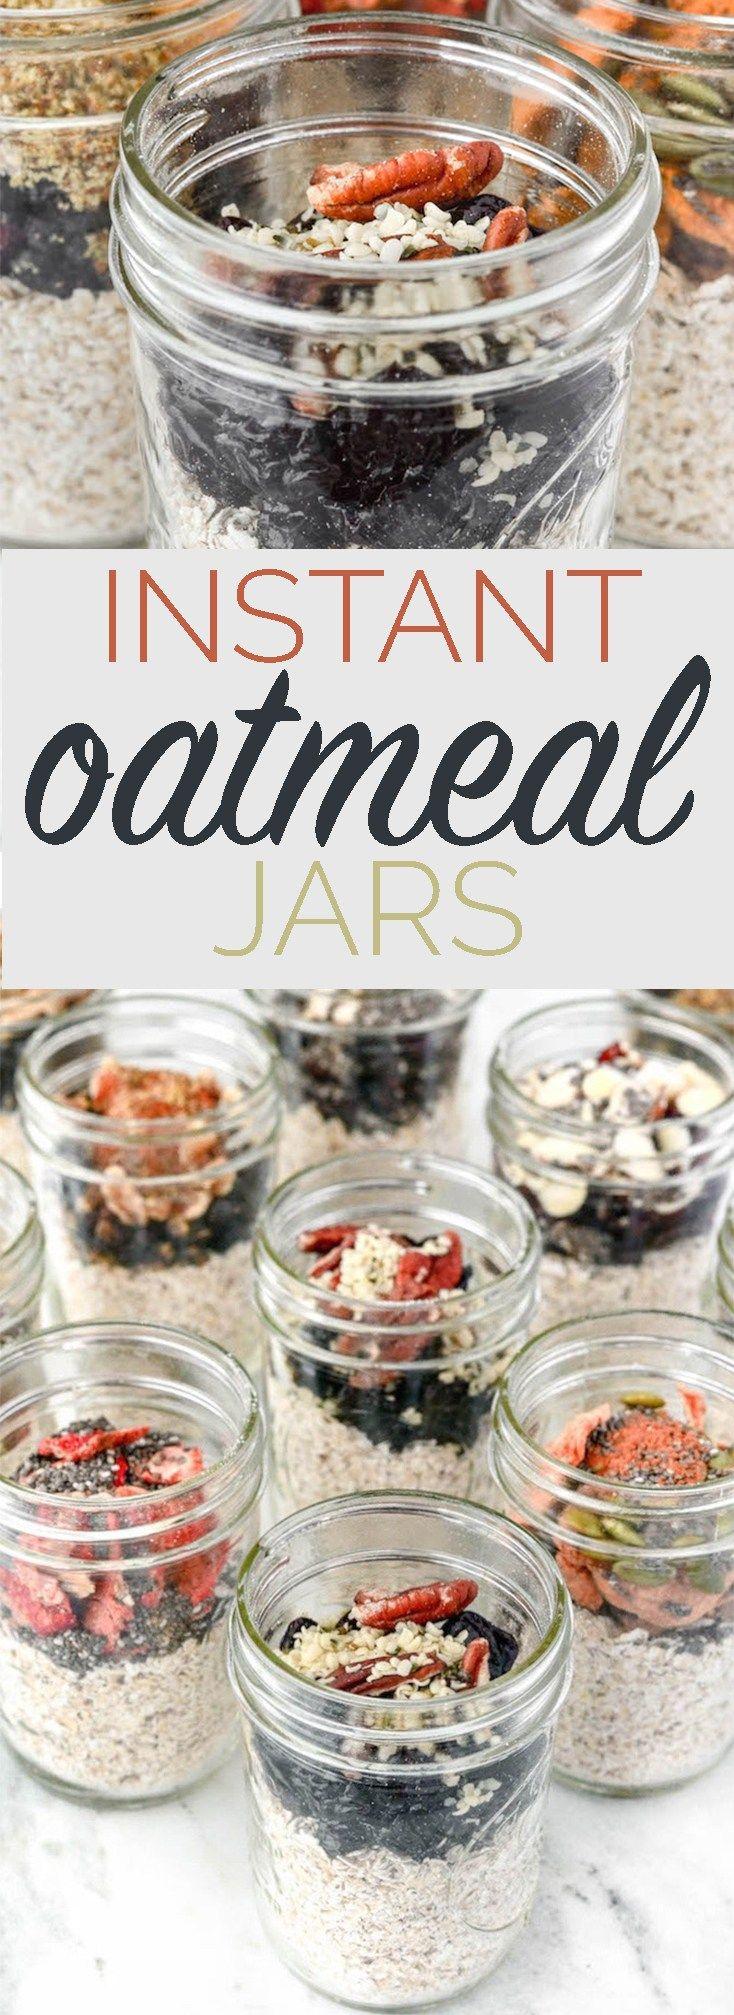 Best 20+ Instant Oatmeal Recipes ideas on Pinterest ...